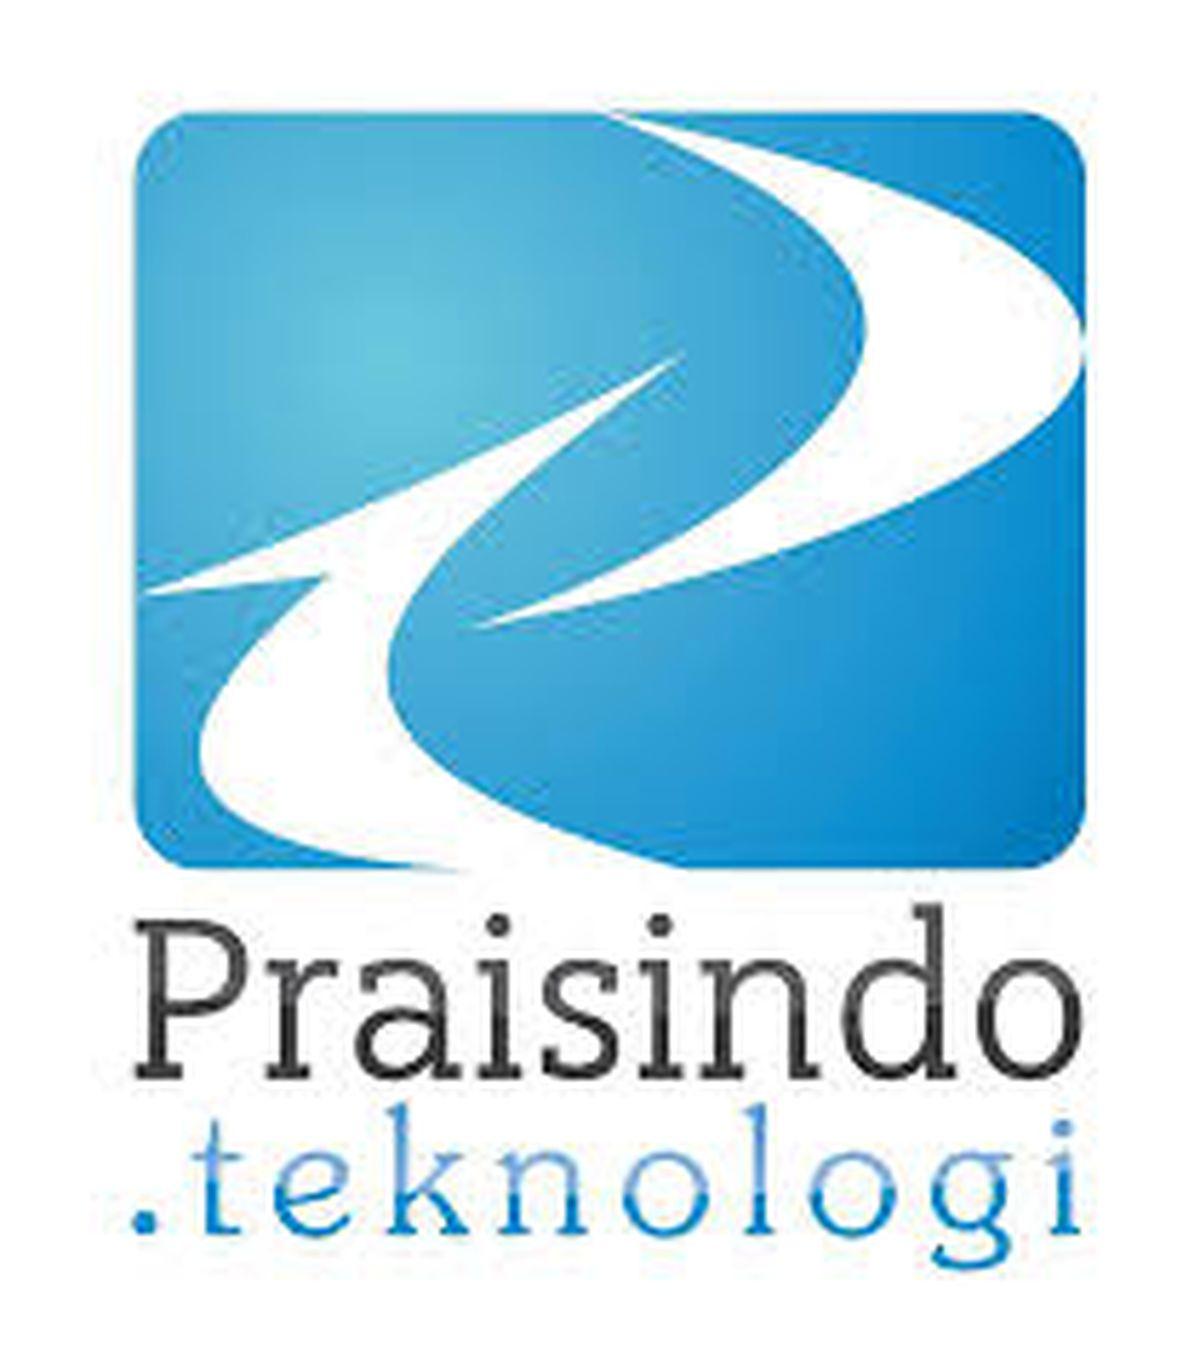 Praisindo Teknologi